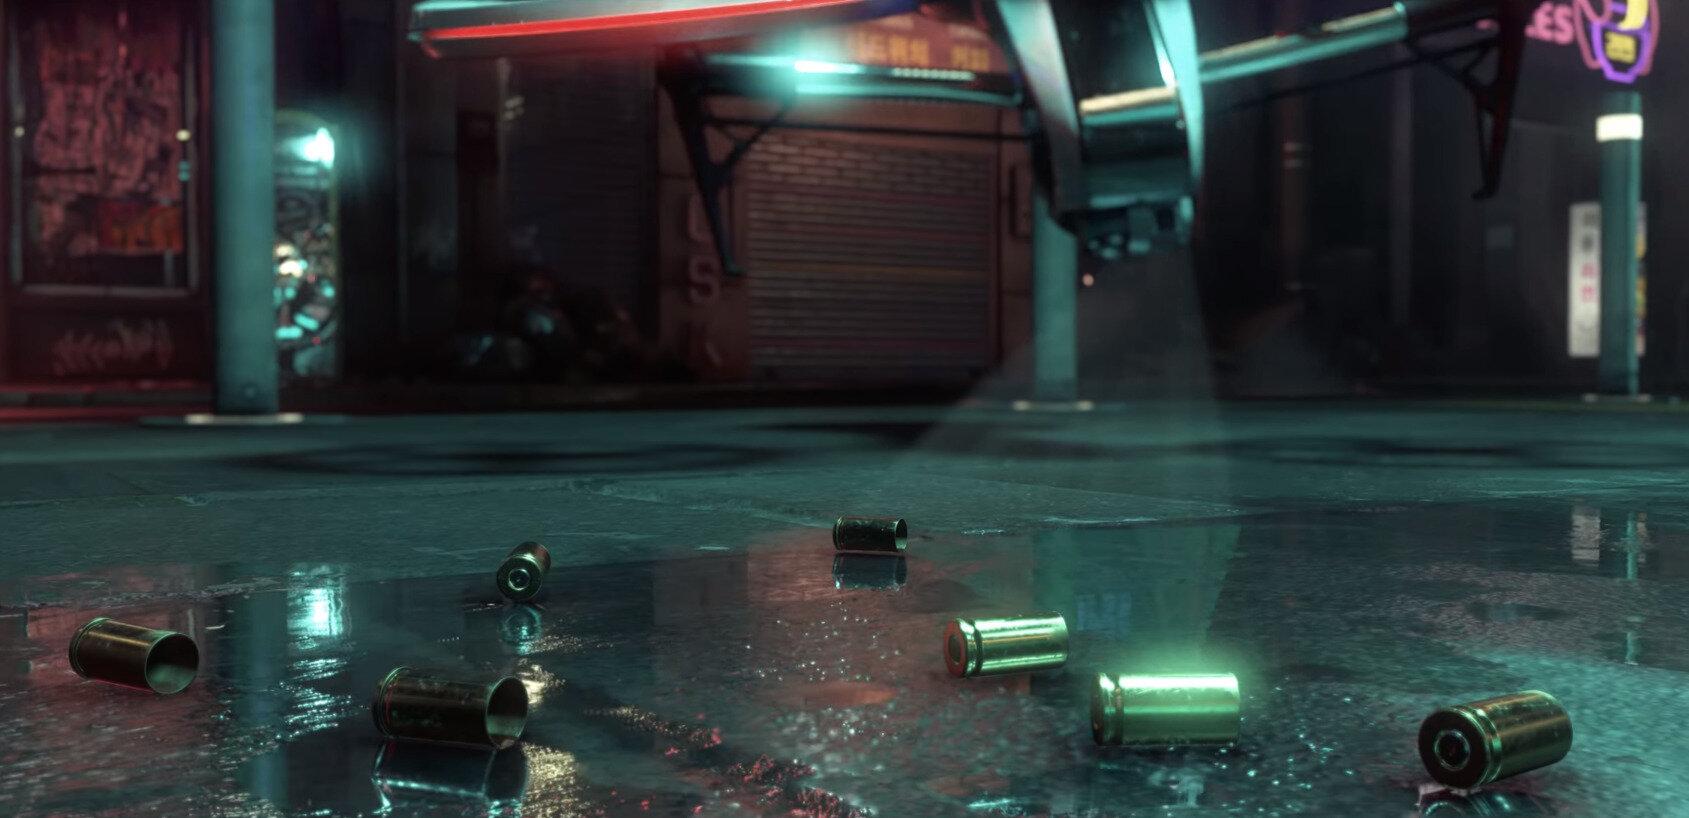 Neon Noir : Crytek publie un benchmark pour sa solution de ray tracing universelle